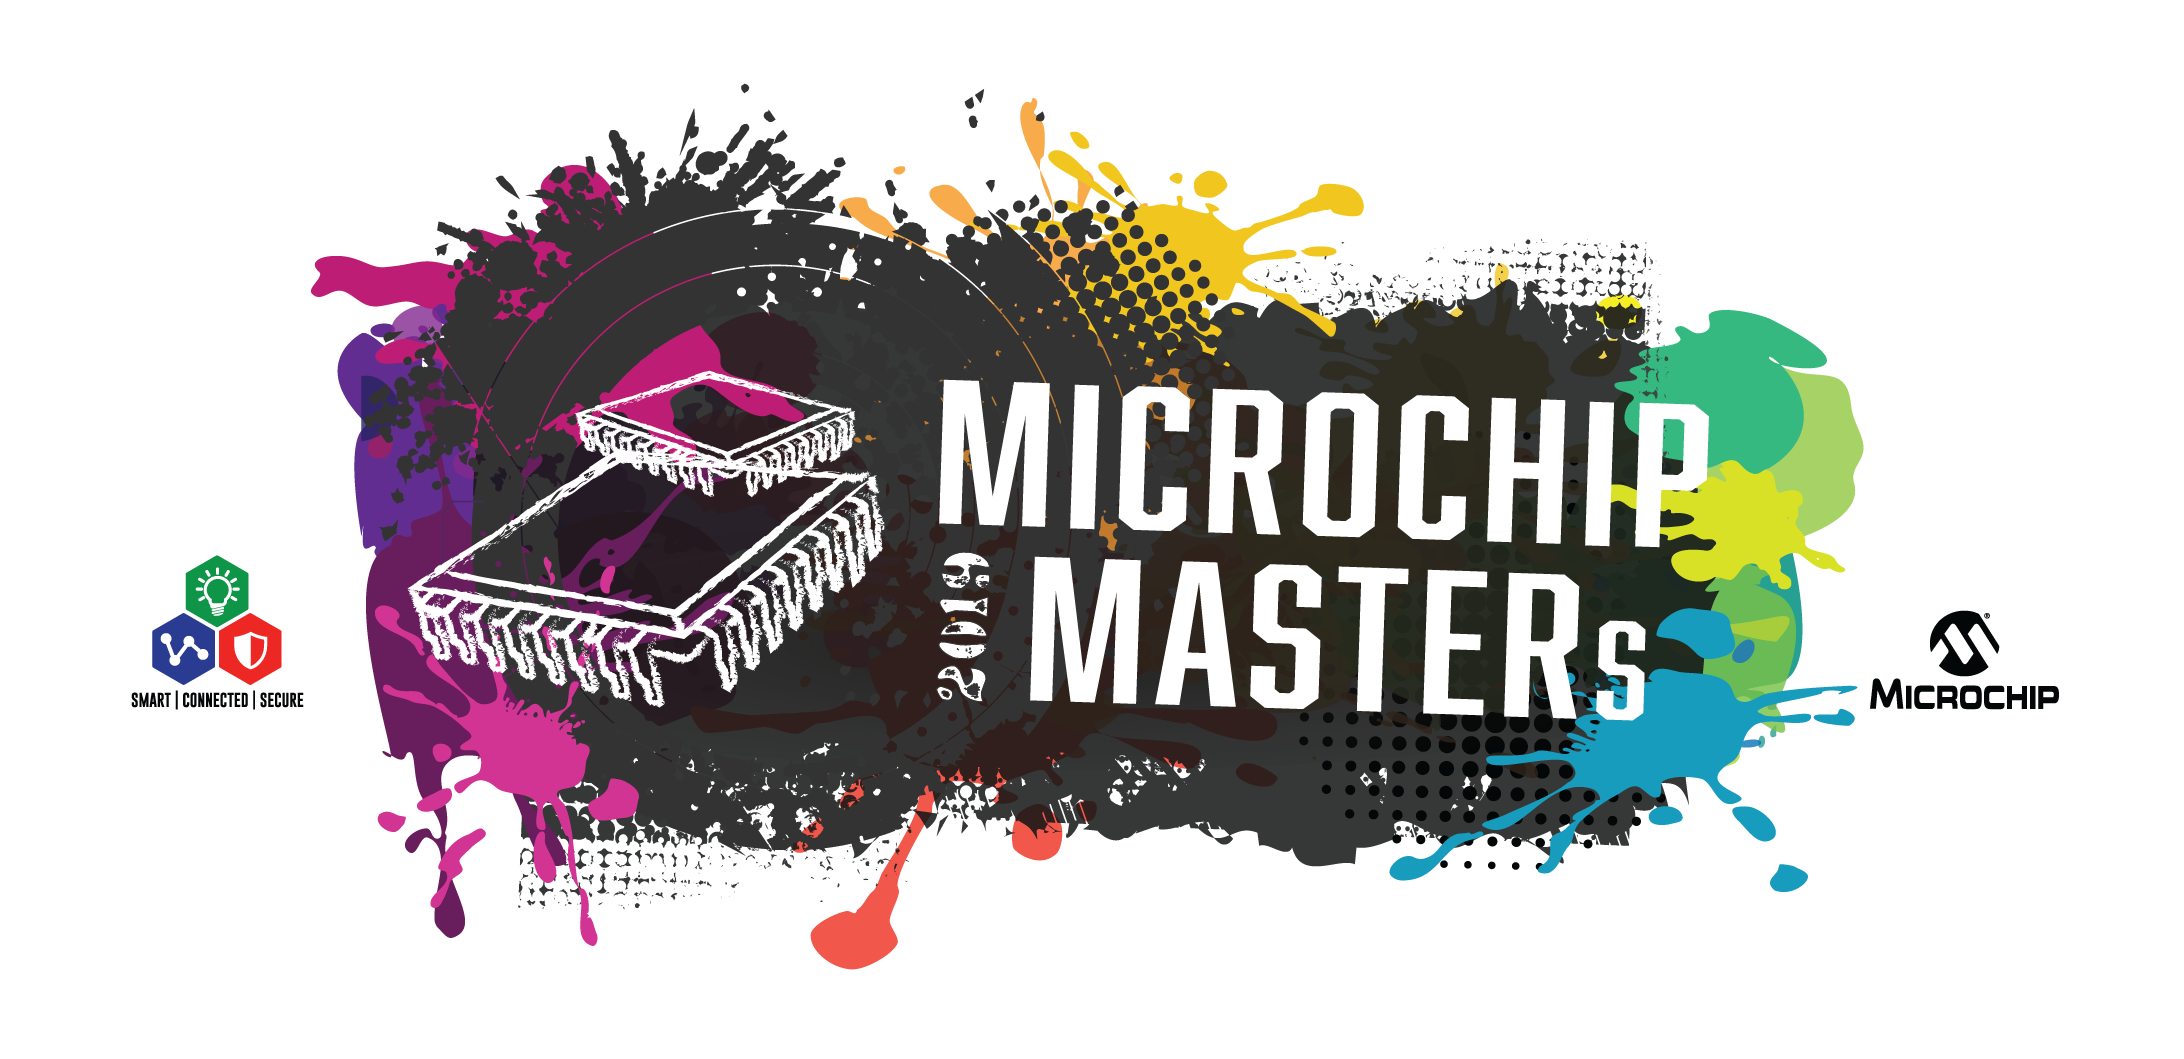 Microchip MASTERS 2019 - Berlin